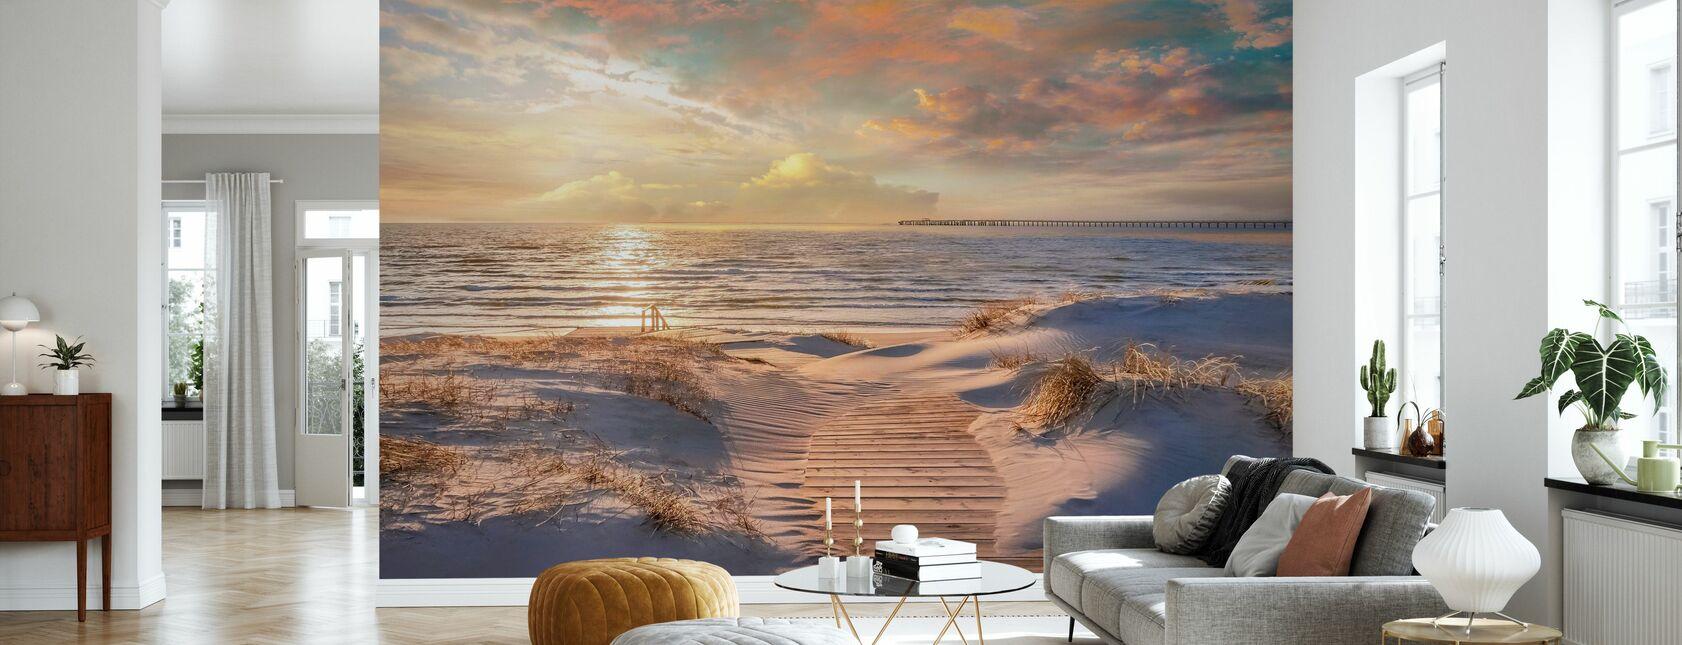 Strand Zand Pad - Behang - Woonkamer